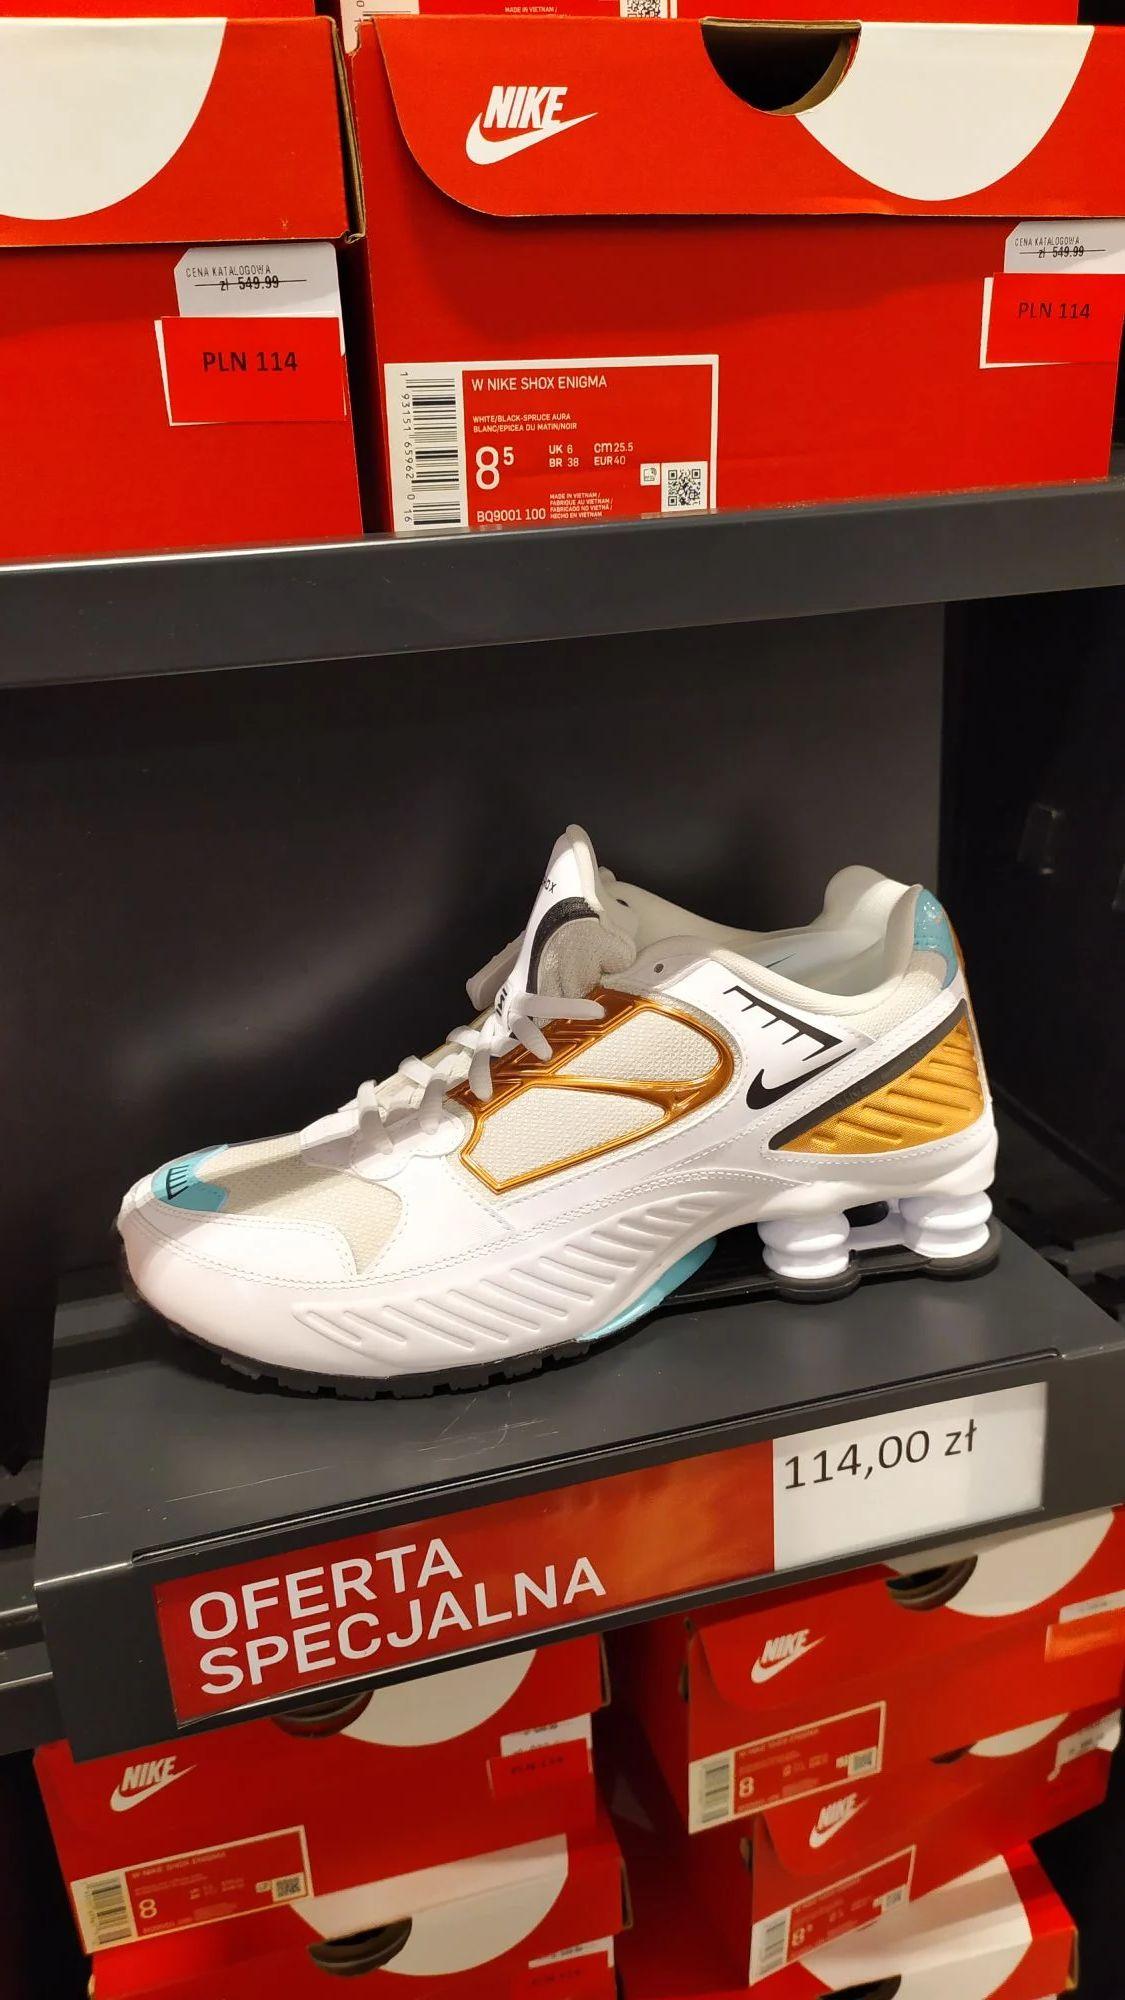 Buty damskie Nike Shox Enigma w factory outlet wroclaw